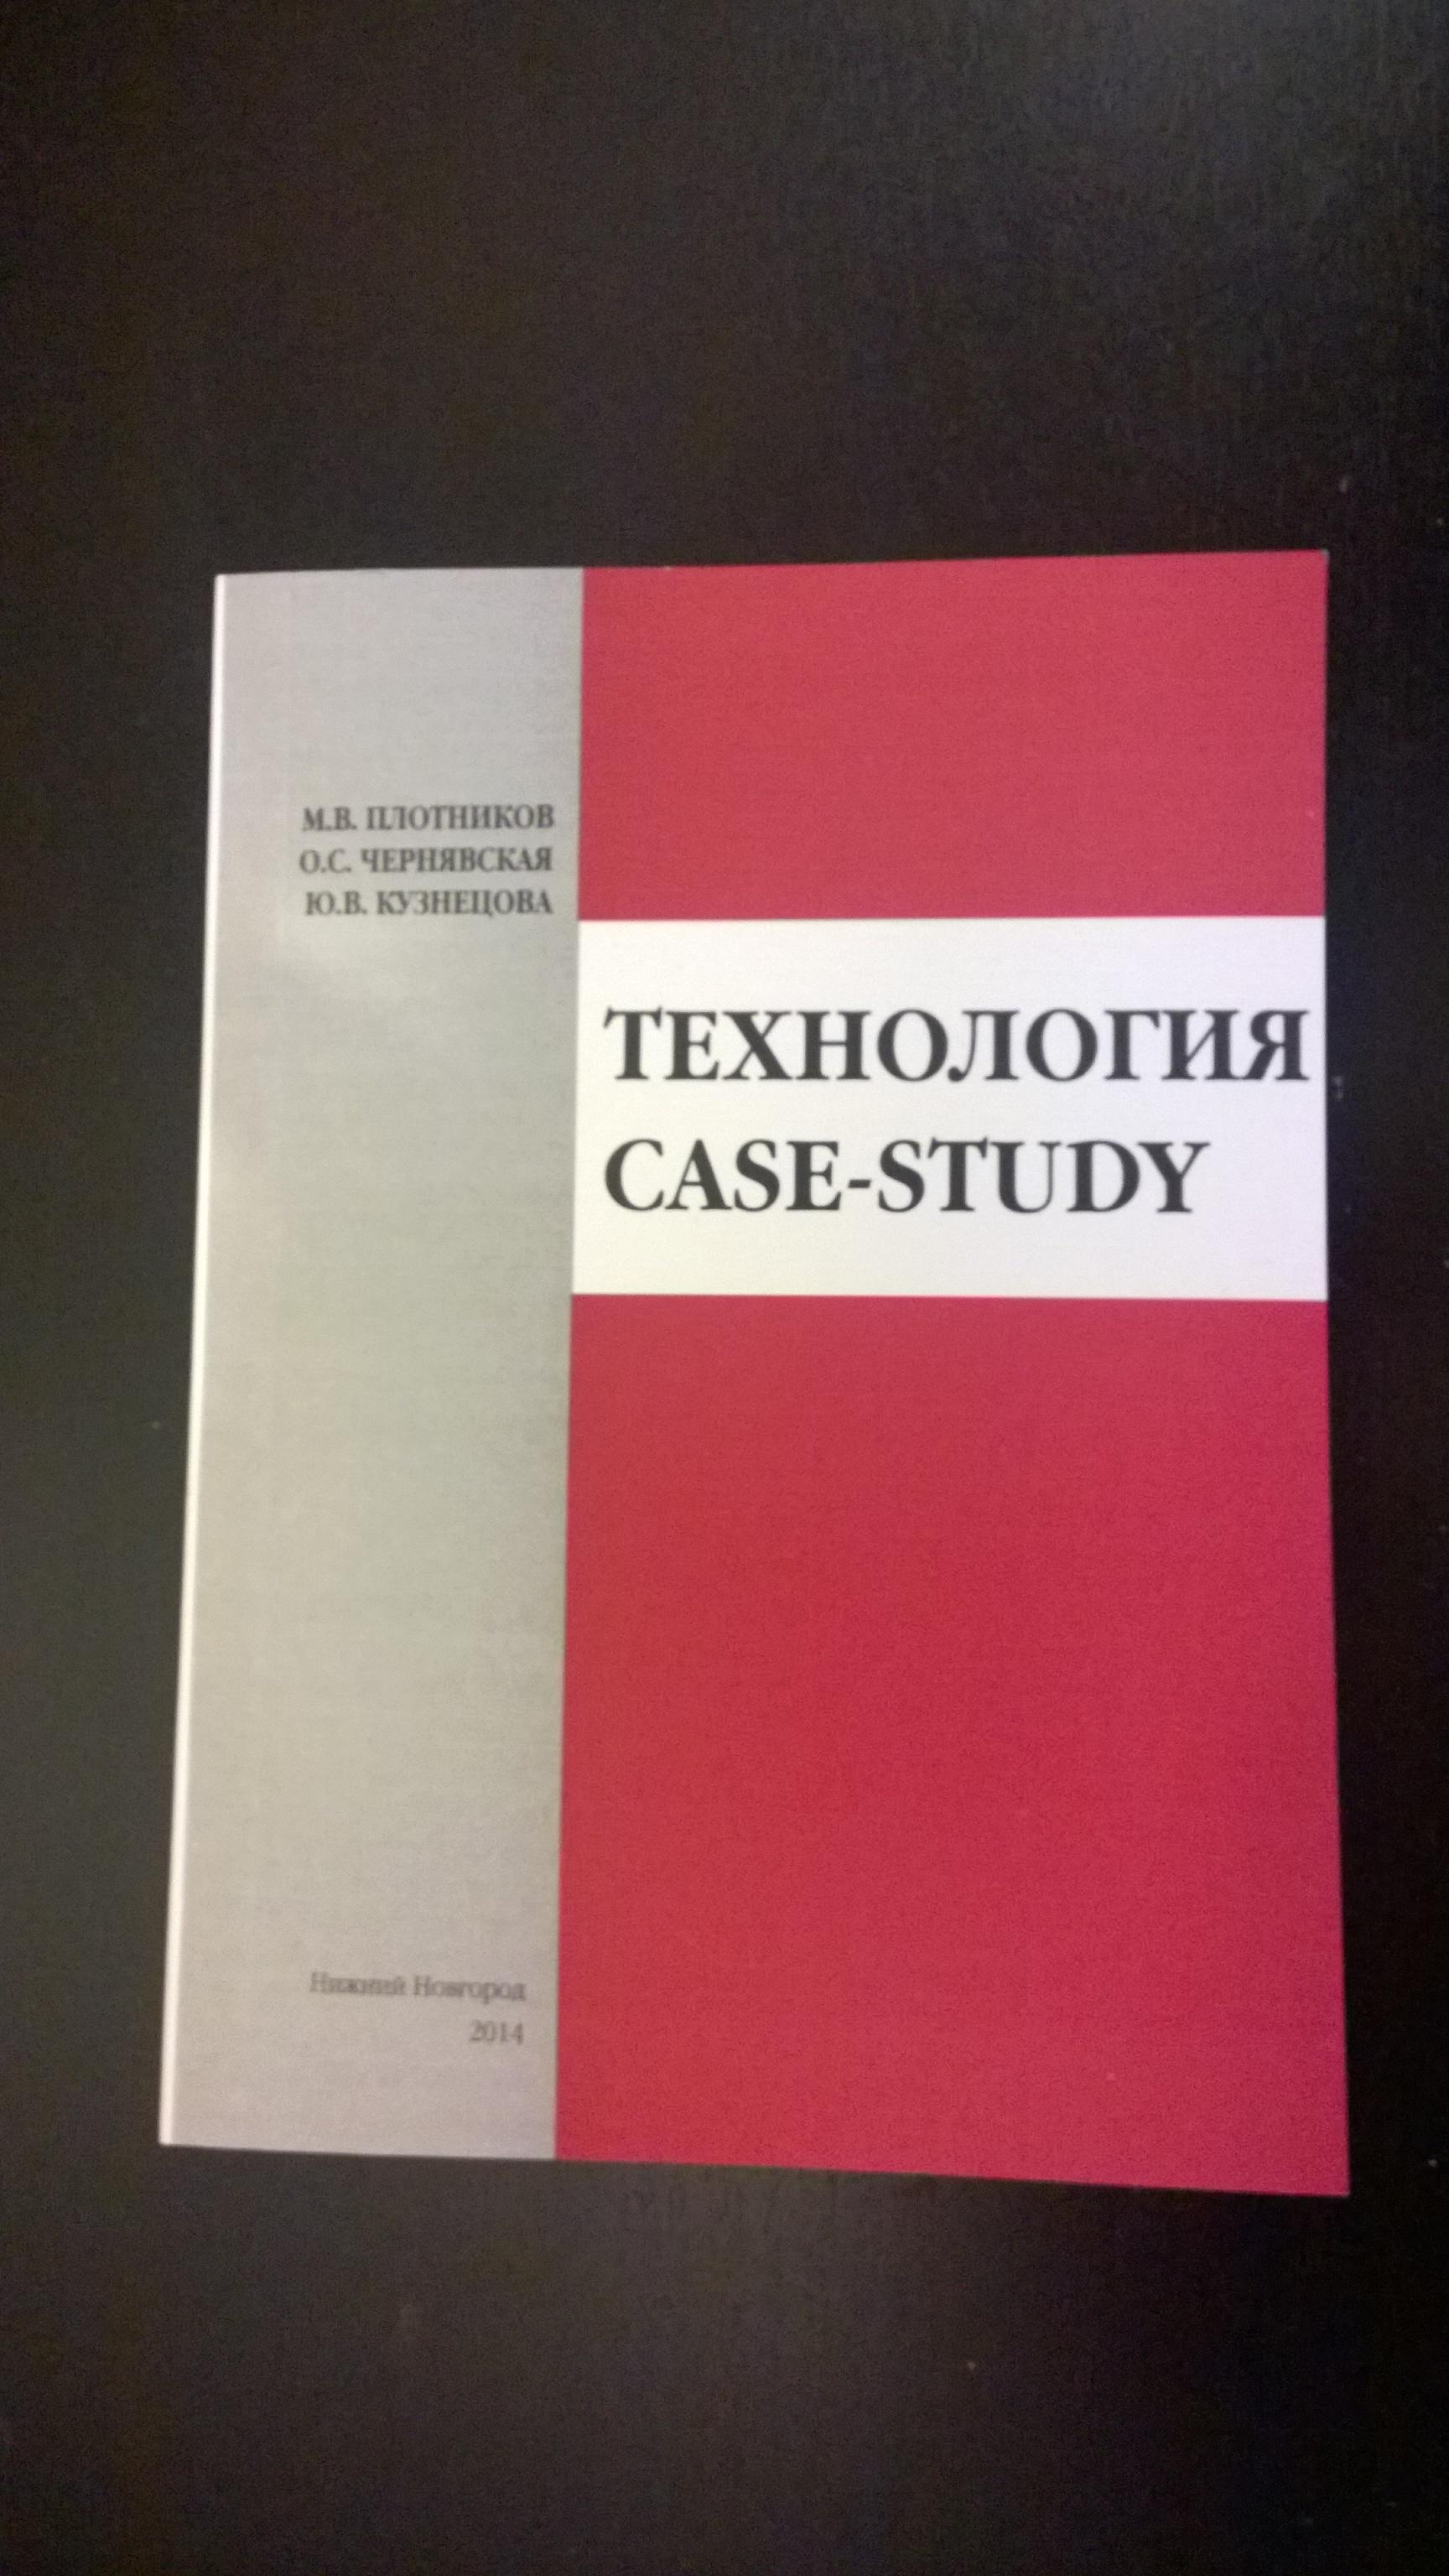 Технология case-study